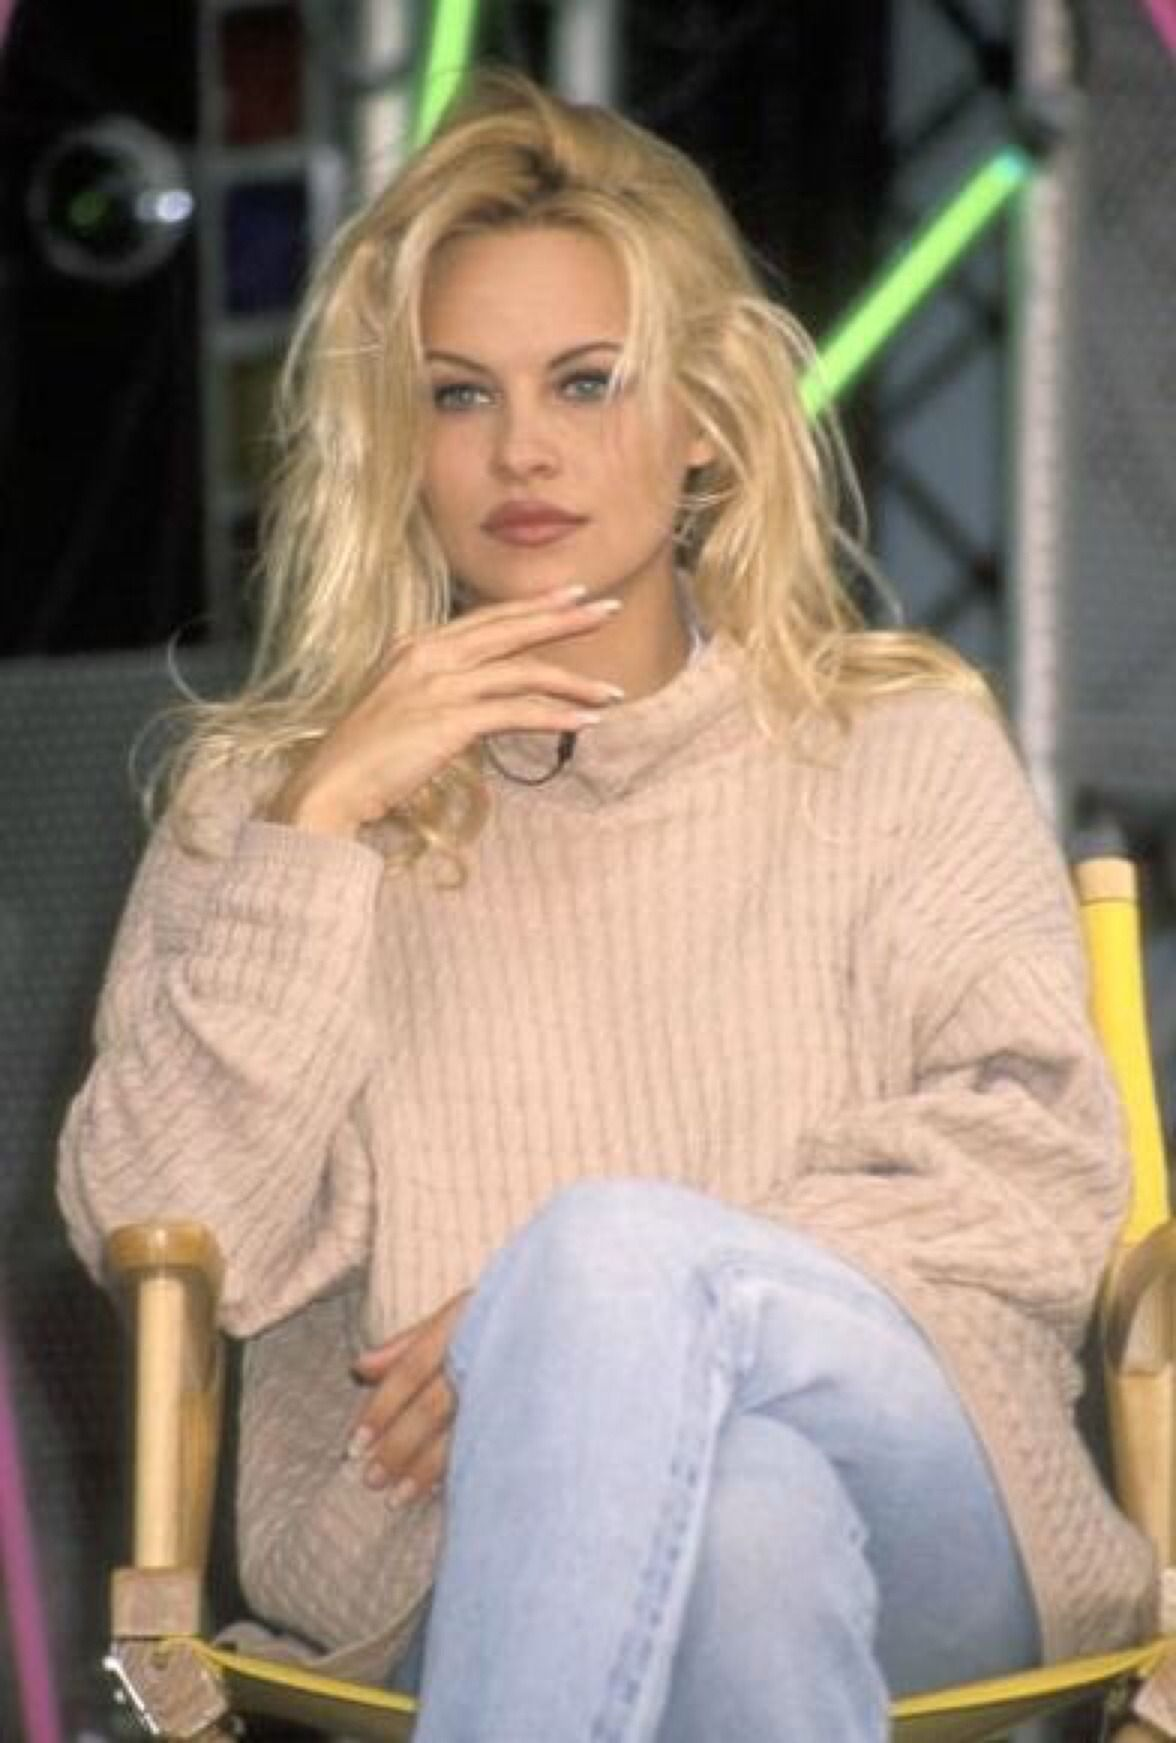 Watch Pamela Anderson (naturalized American citizen) video